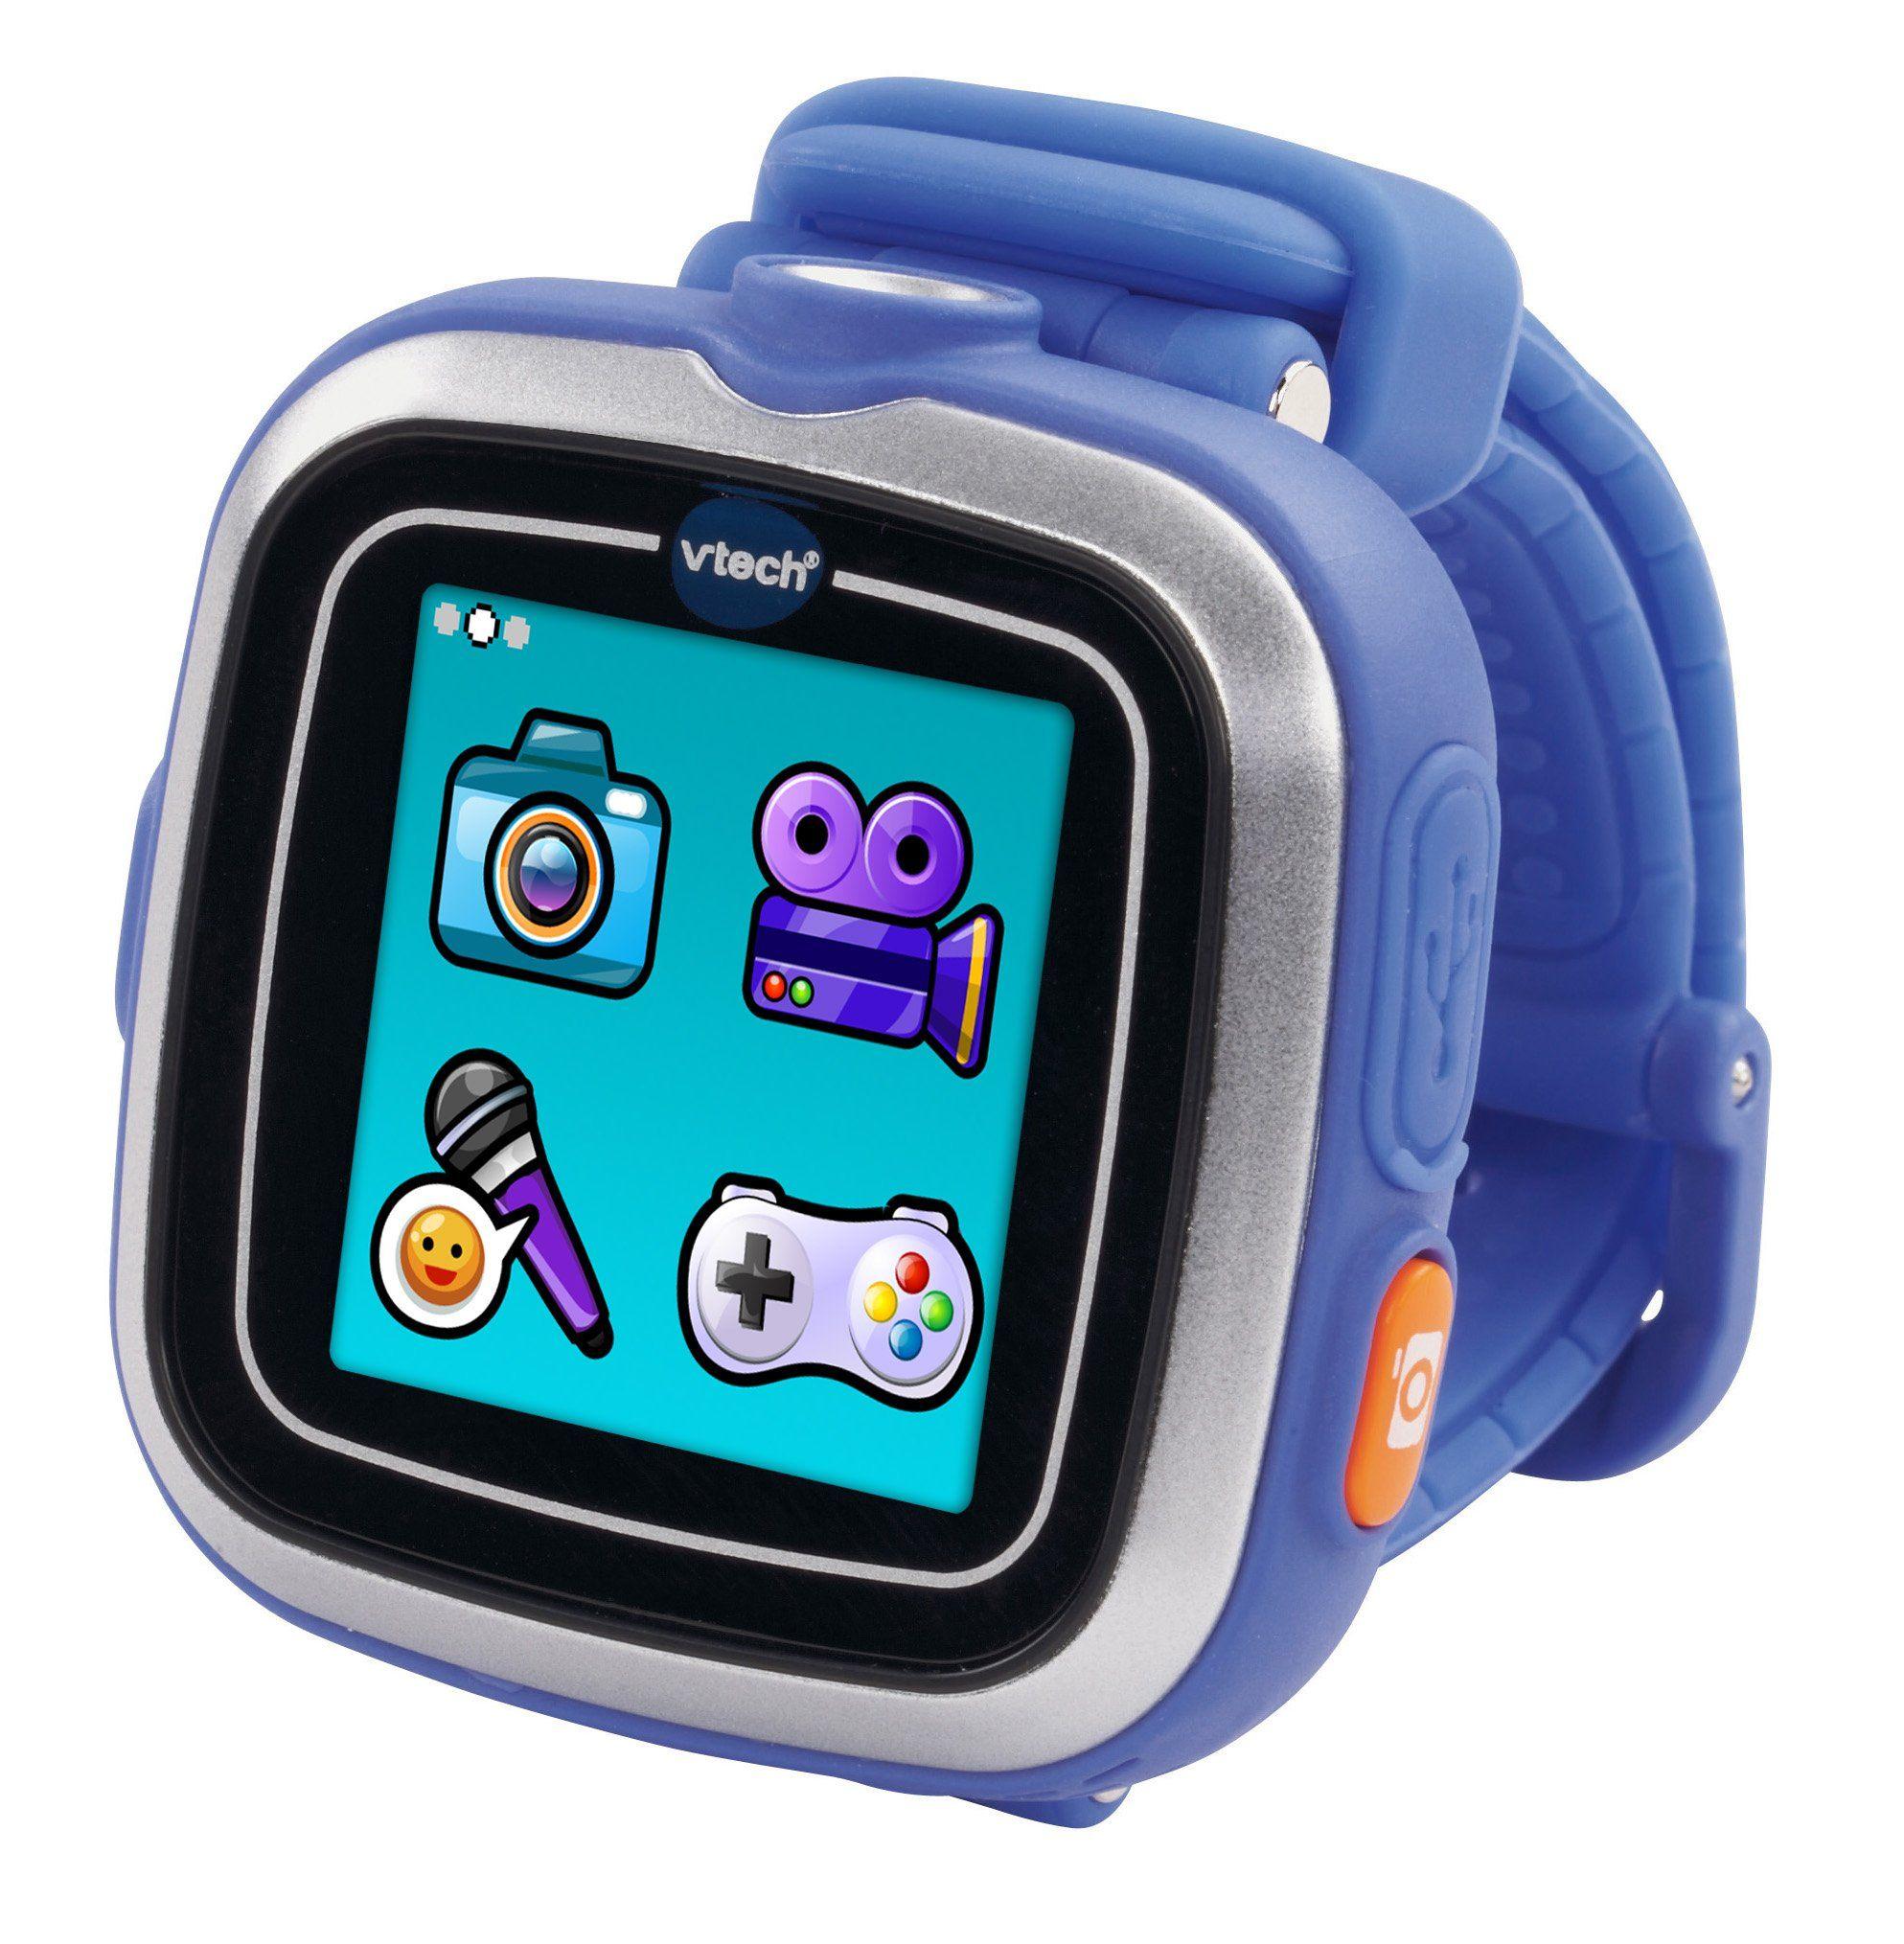 e3b9bc3f98b45e153663dc40ab62c58e Kidizoom Smartwatch